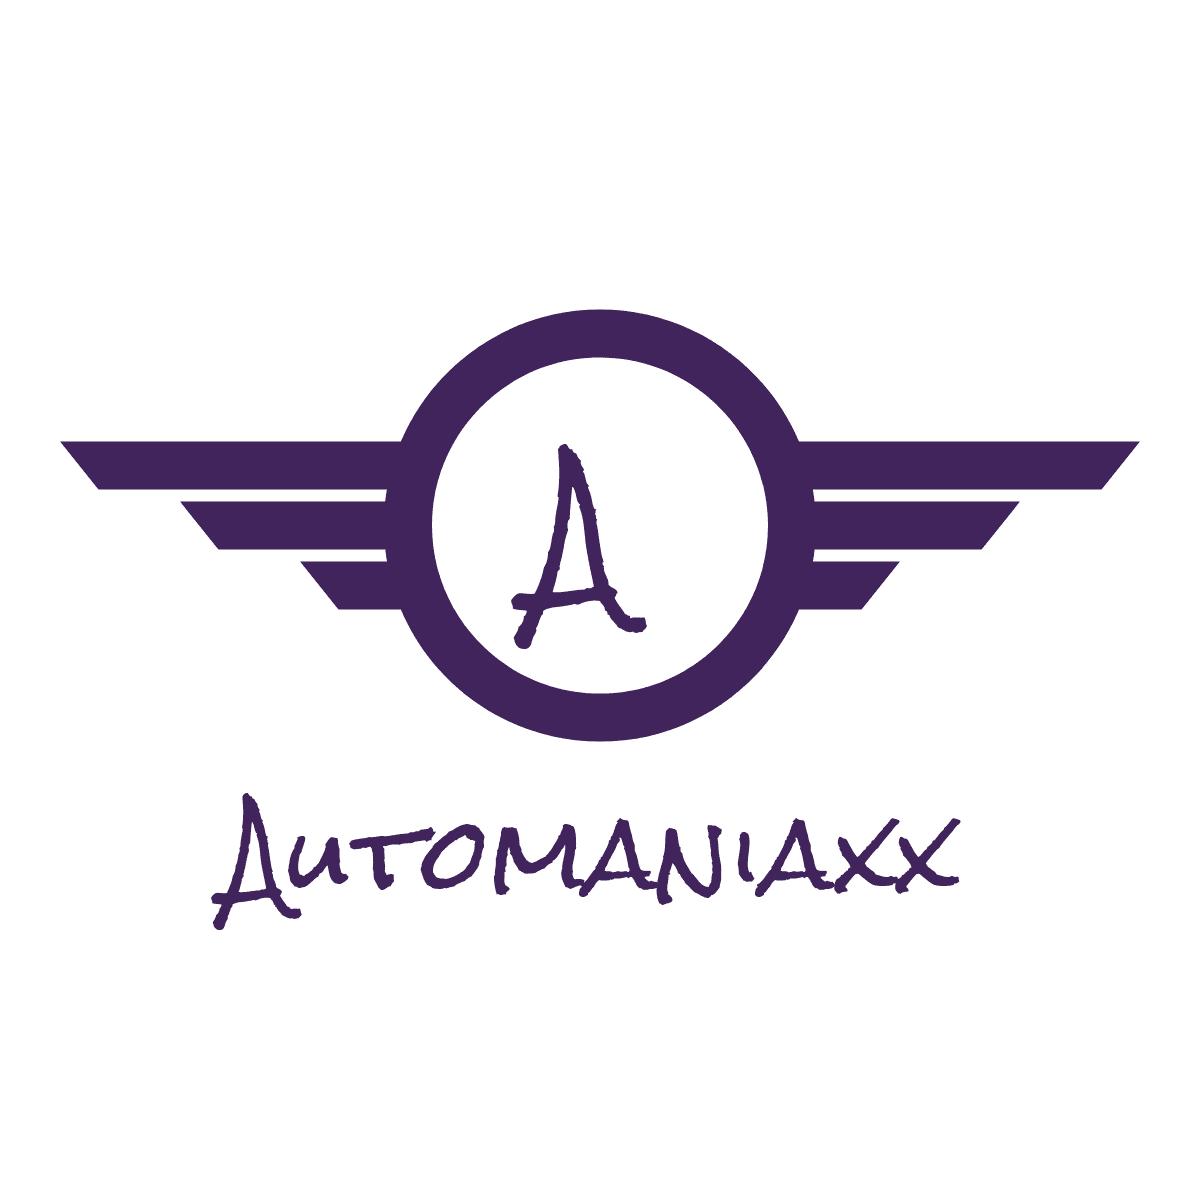 AUTOMANIAXX primary image